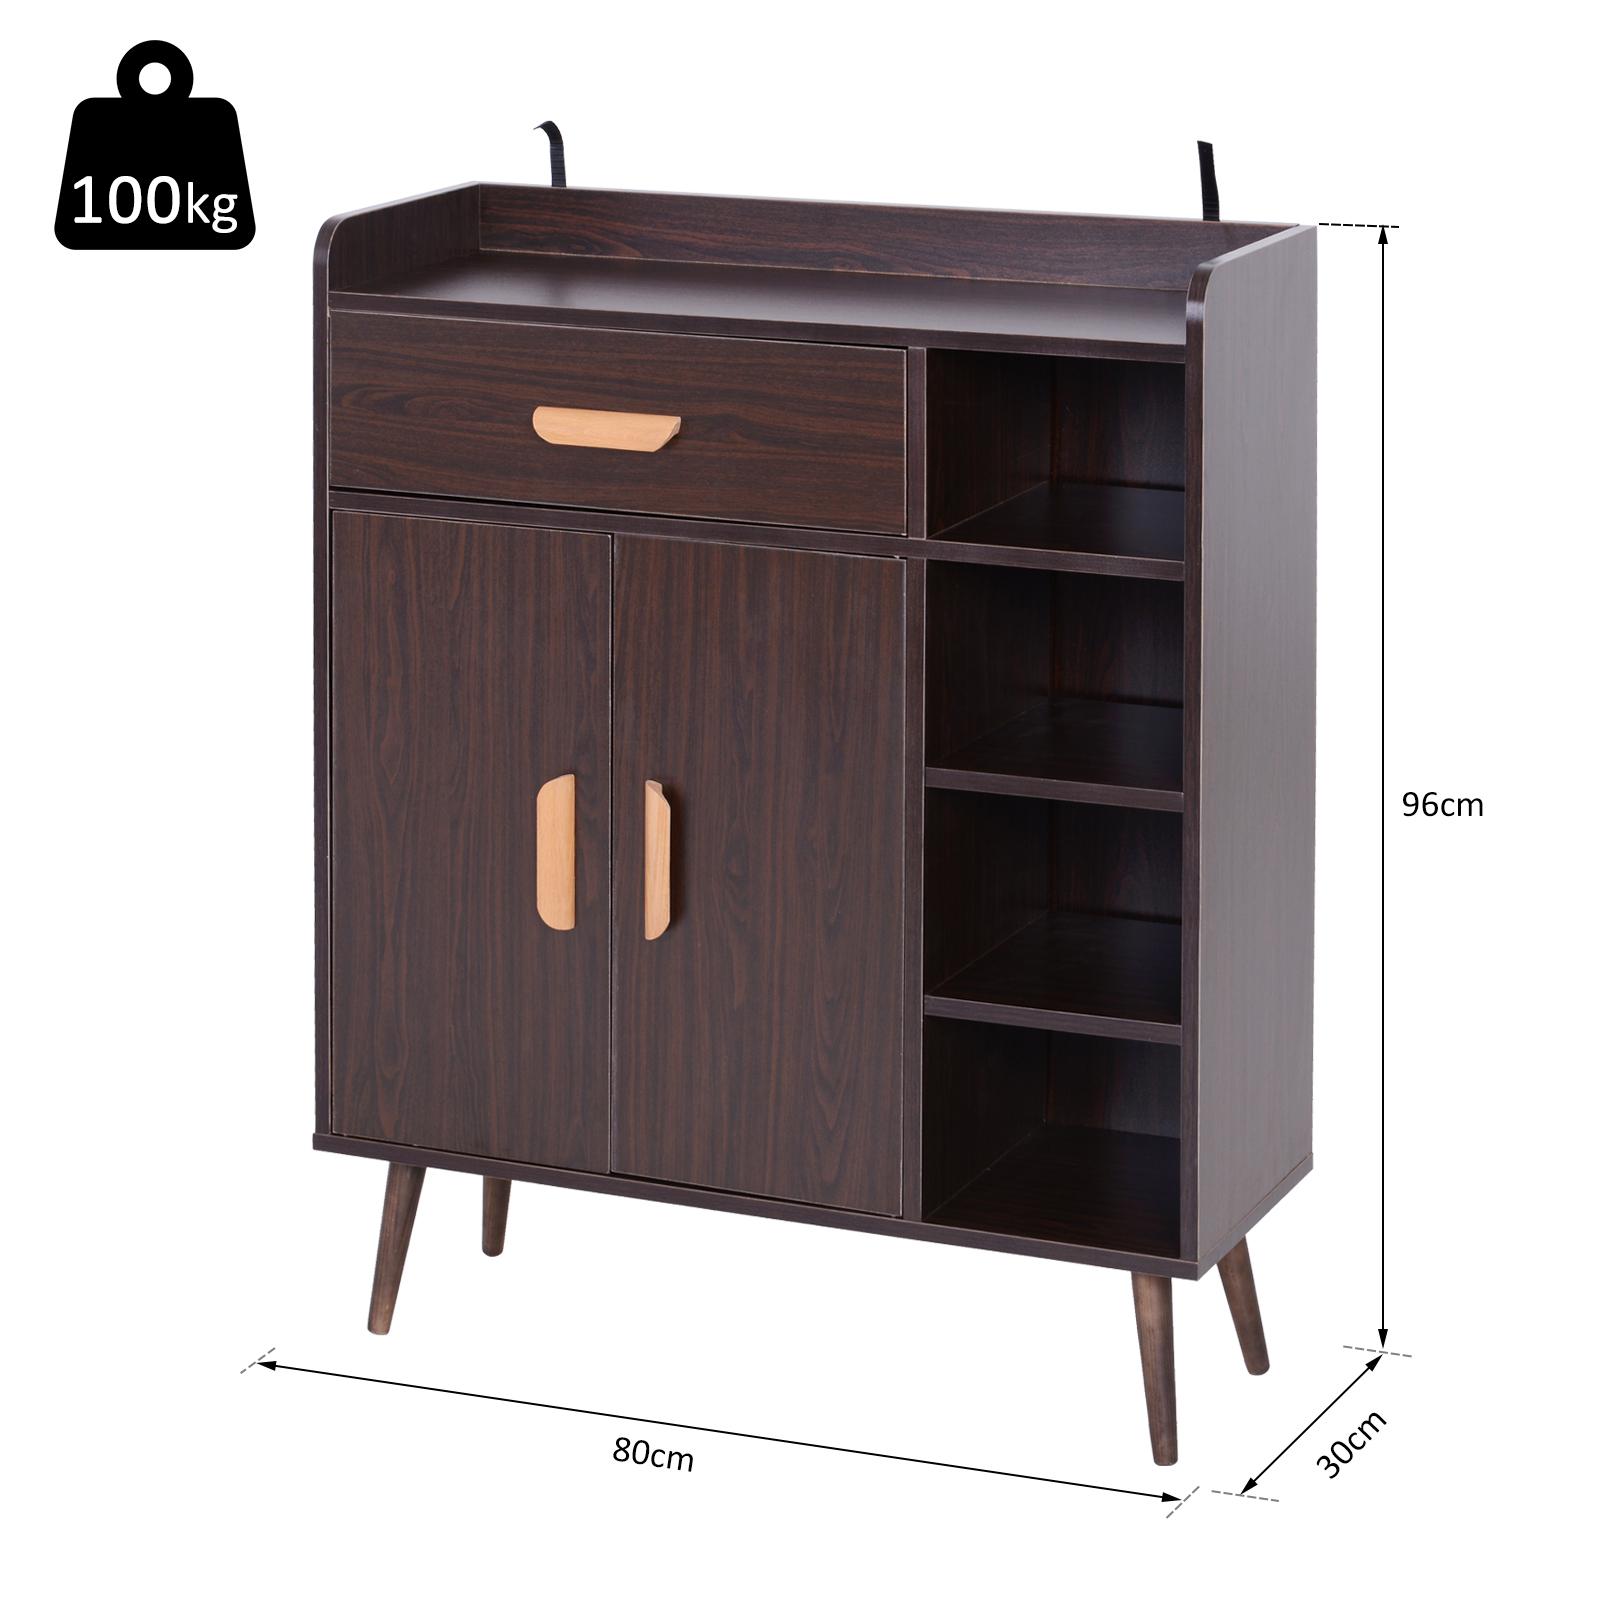 thumbnail 3 - Side-Cabinet-Hallway-Storage-Unit-Console-Table-Entrance-Shelf-Cupboard-2-color